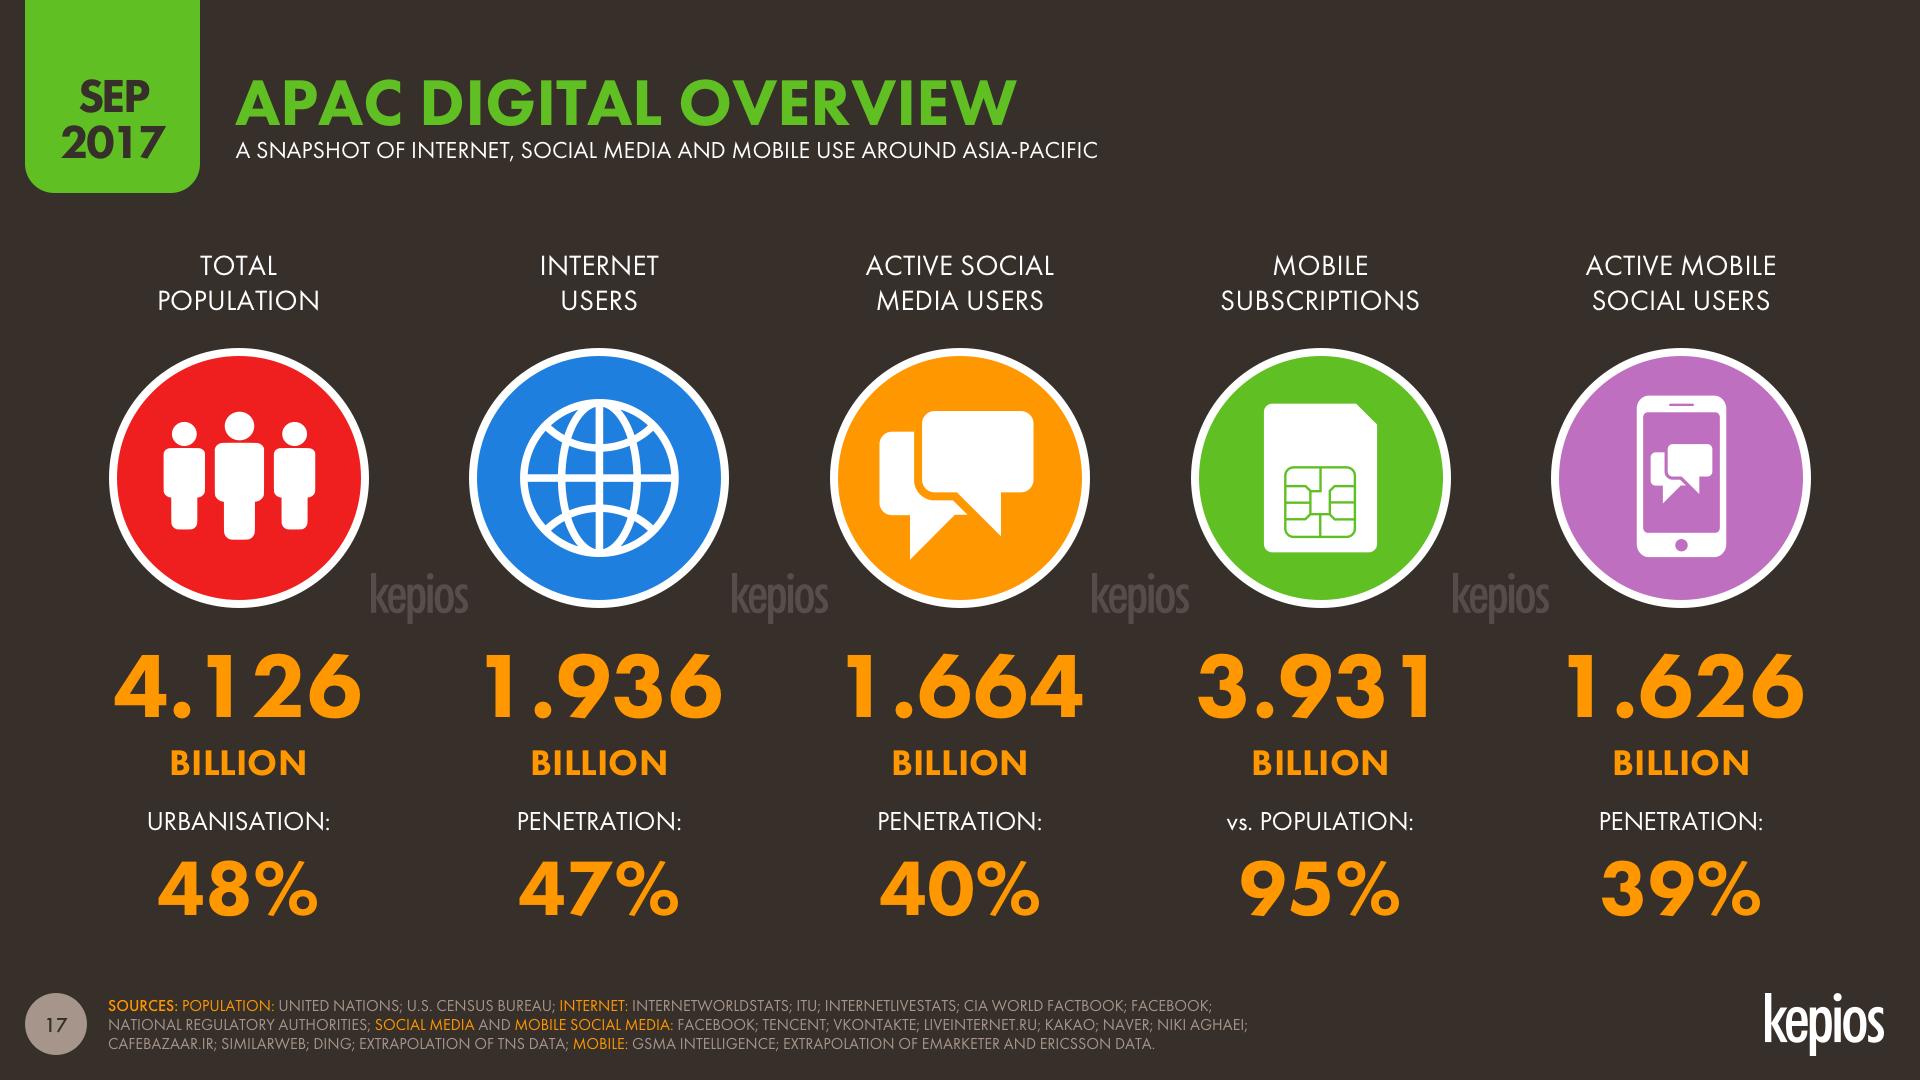 APAC Digital Overview, Sep 2017